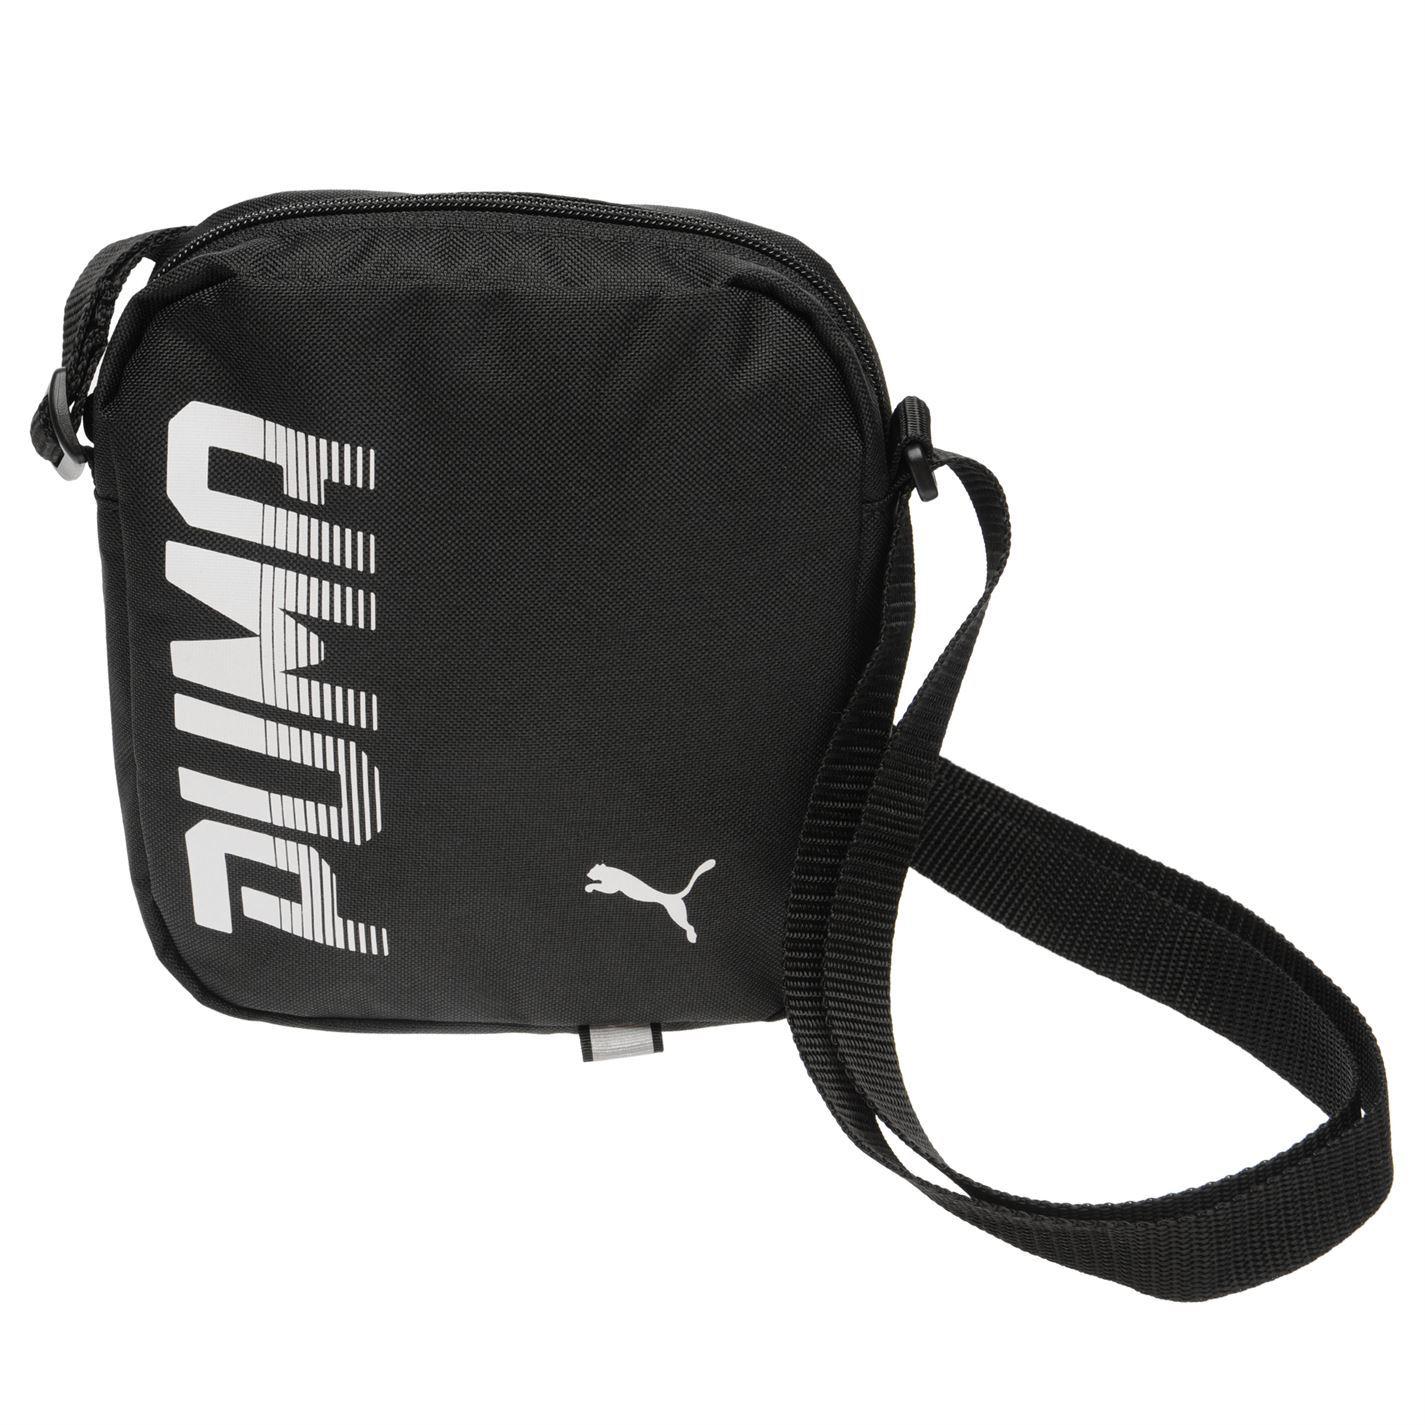 4b0fe1915a5 Puma Pioneer Portable Shoulder Bag Black Small Item Case Holdall   eBay